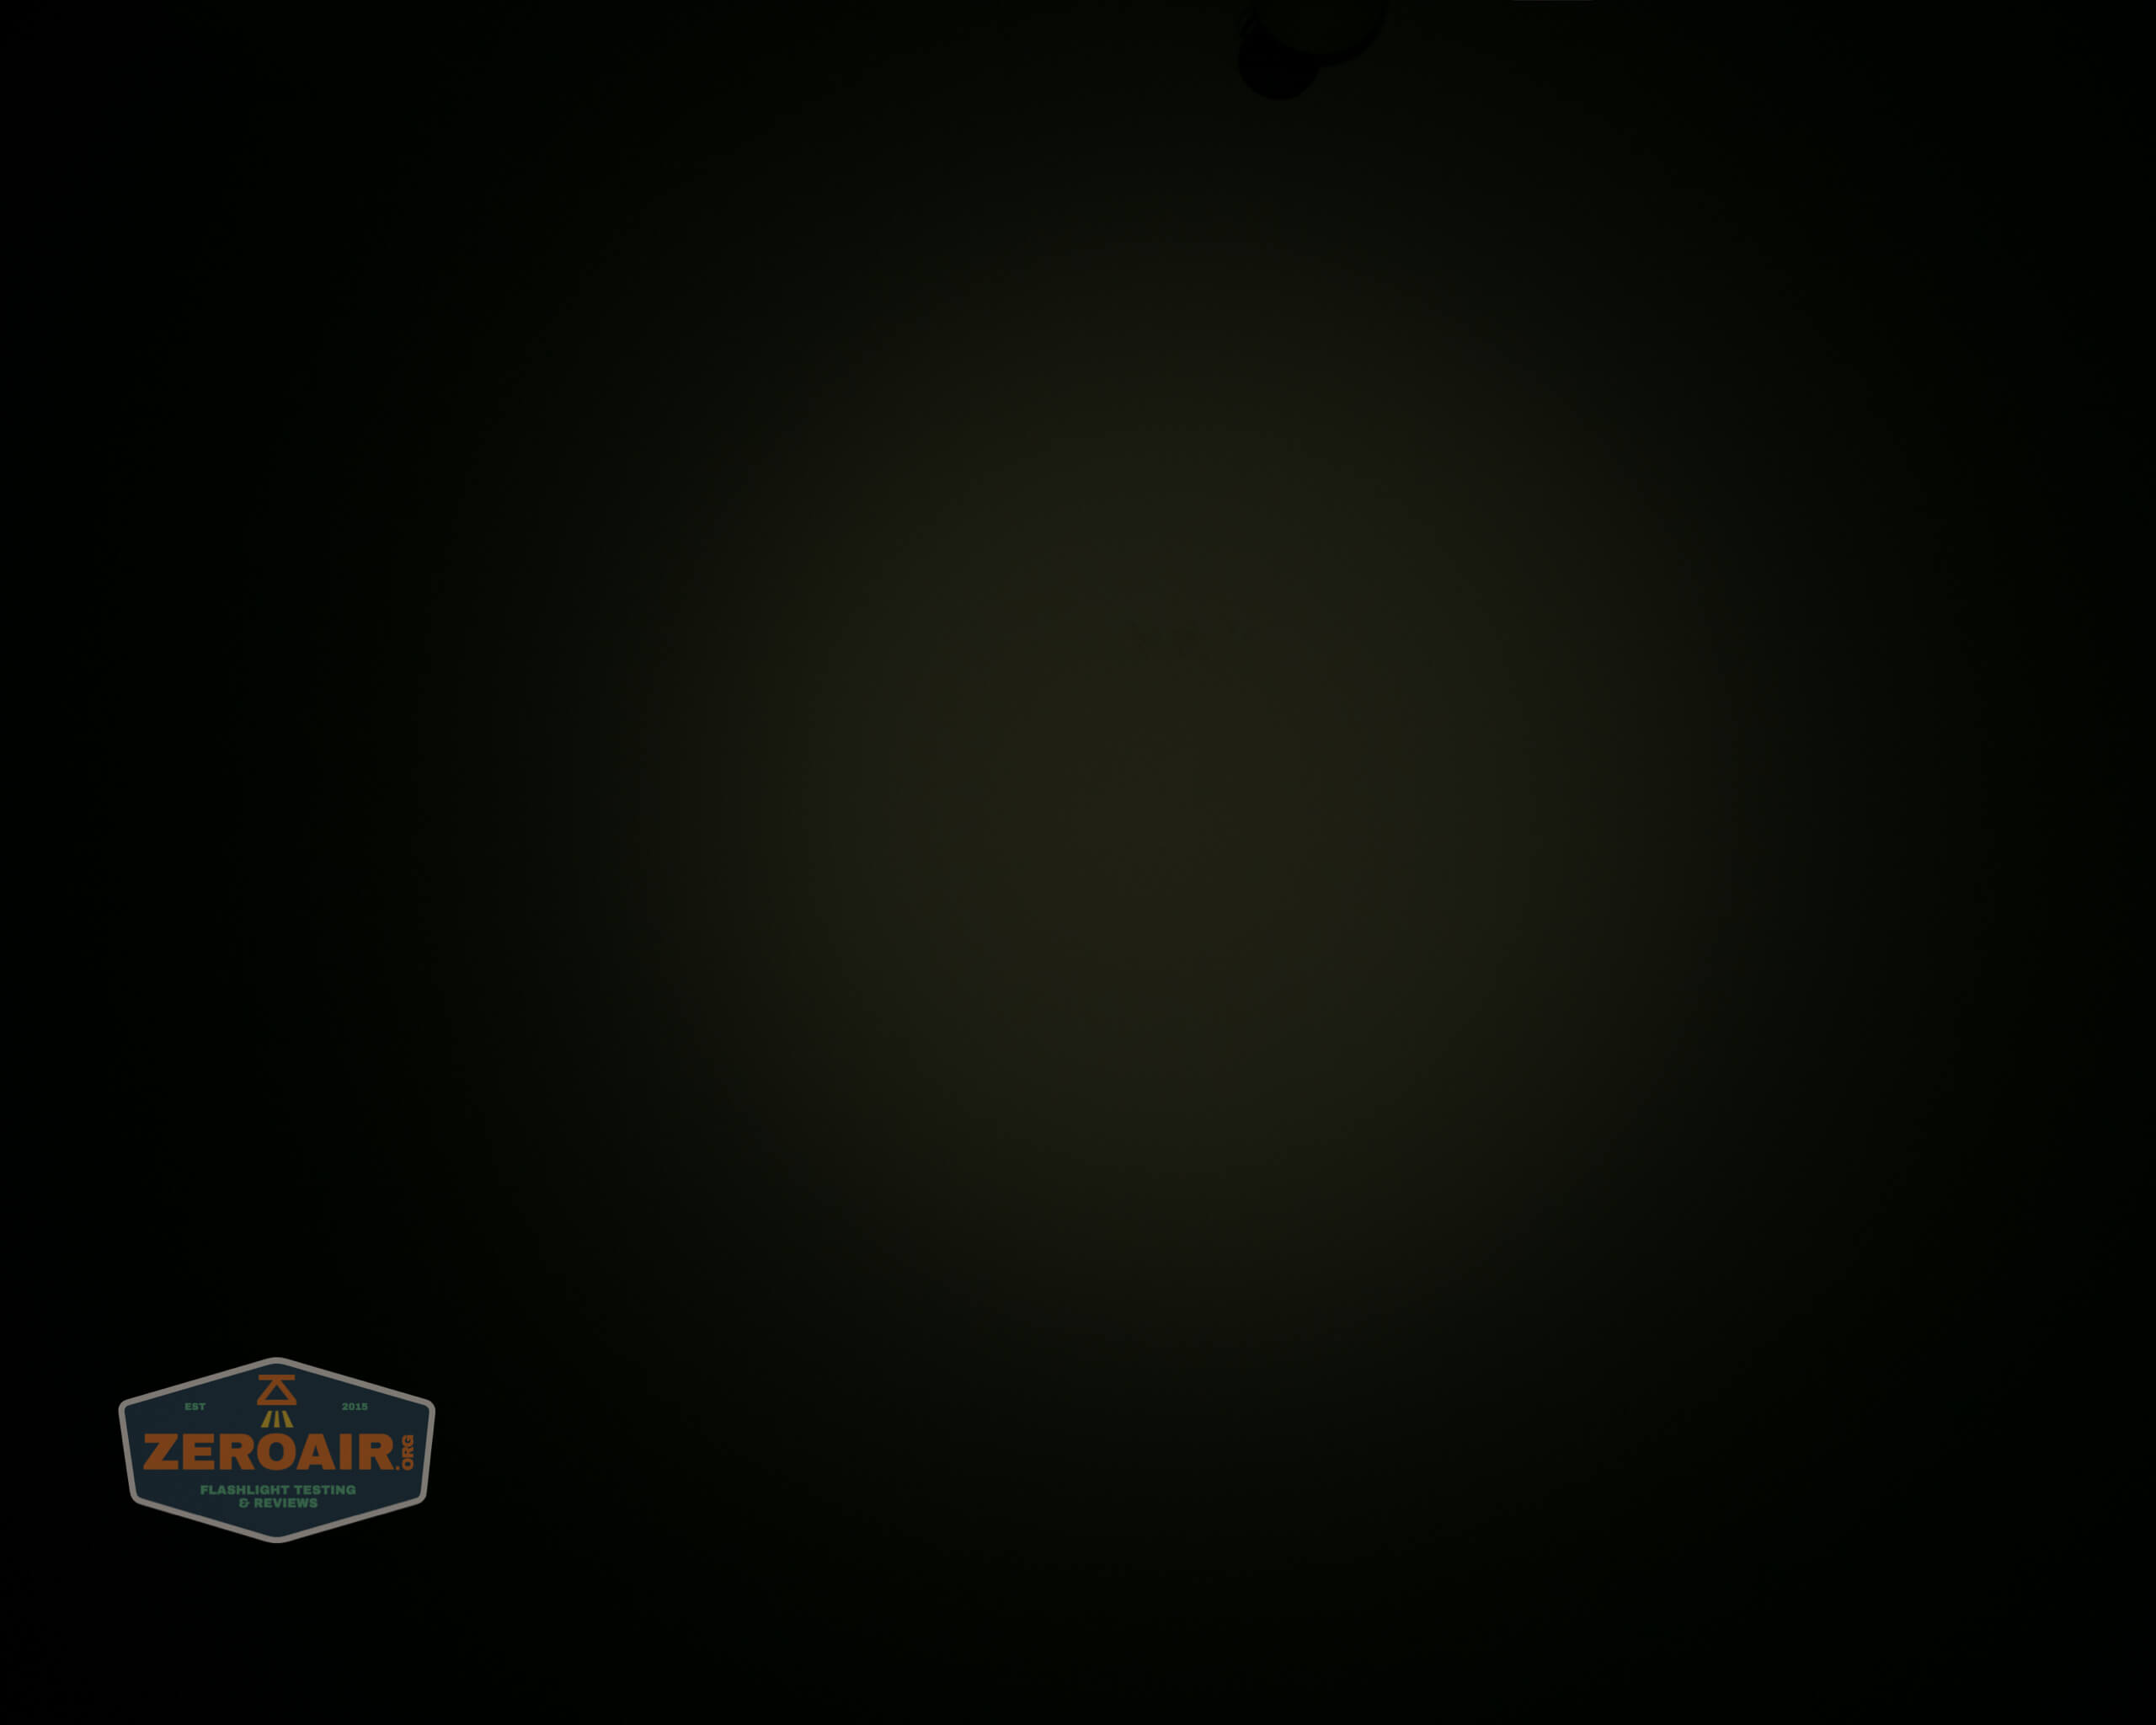 manker e14iii 18650 flood flashlight beamshot ceiling 5